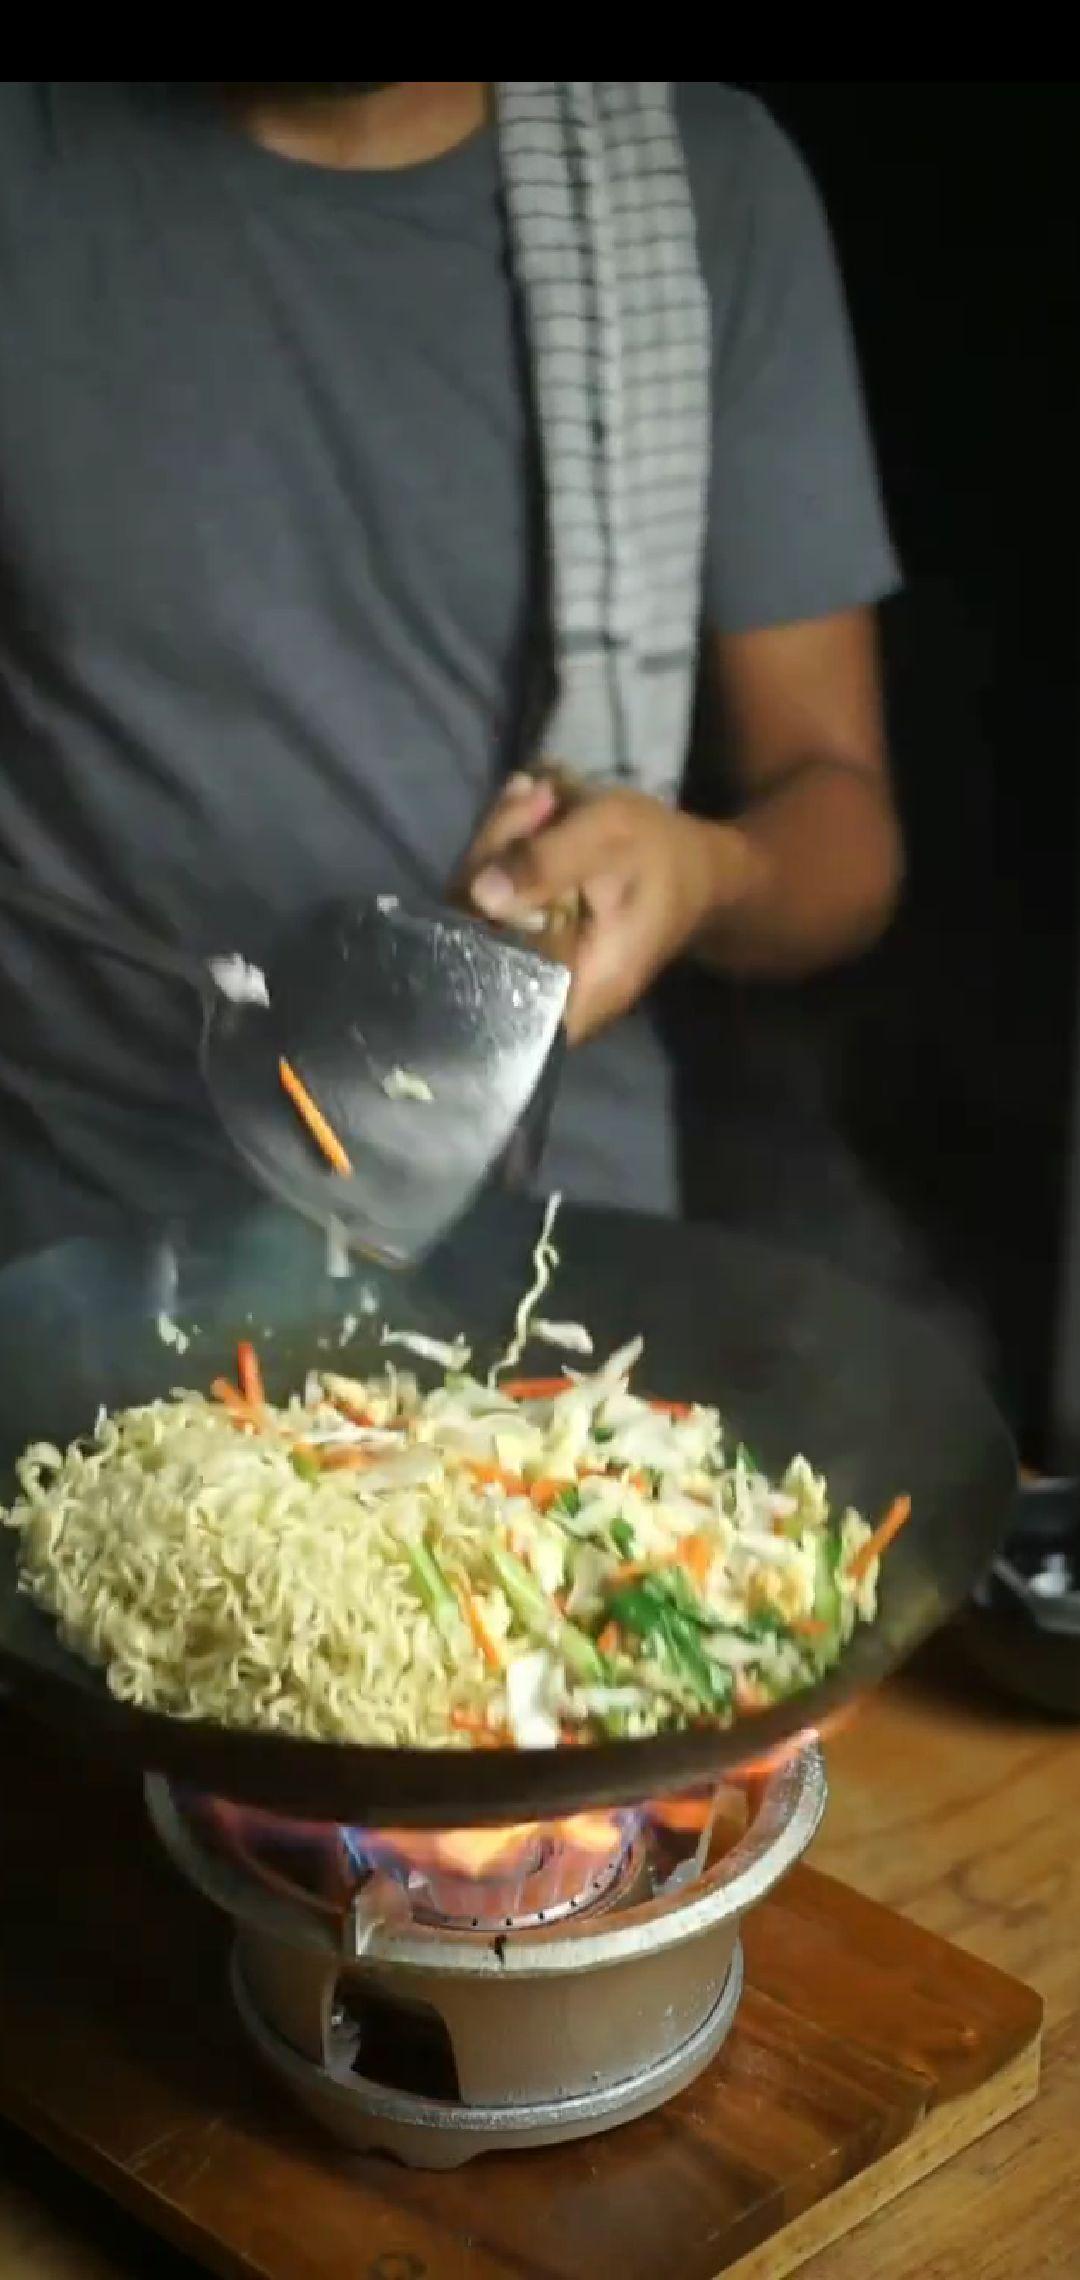 dandan ala tukang nasi goreng